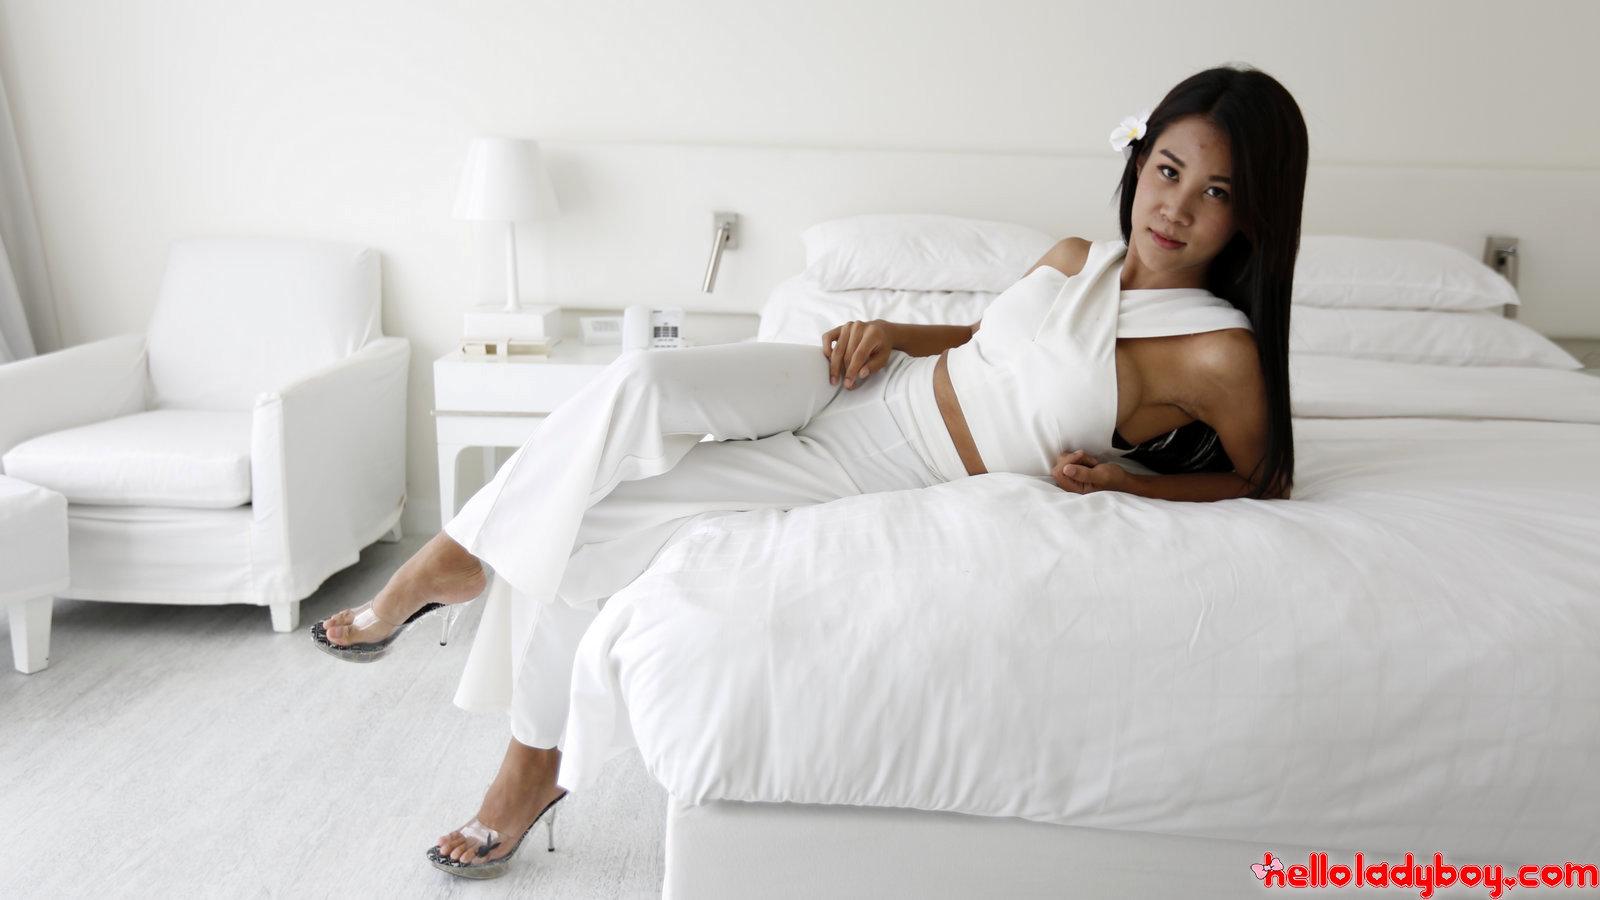 Asian Femboy Fuck's And Sucks White Tourist Penis